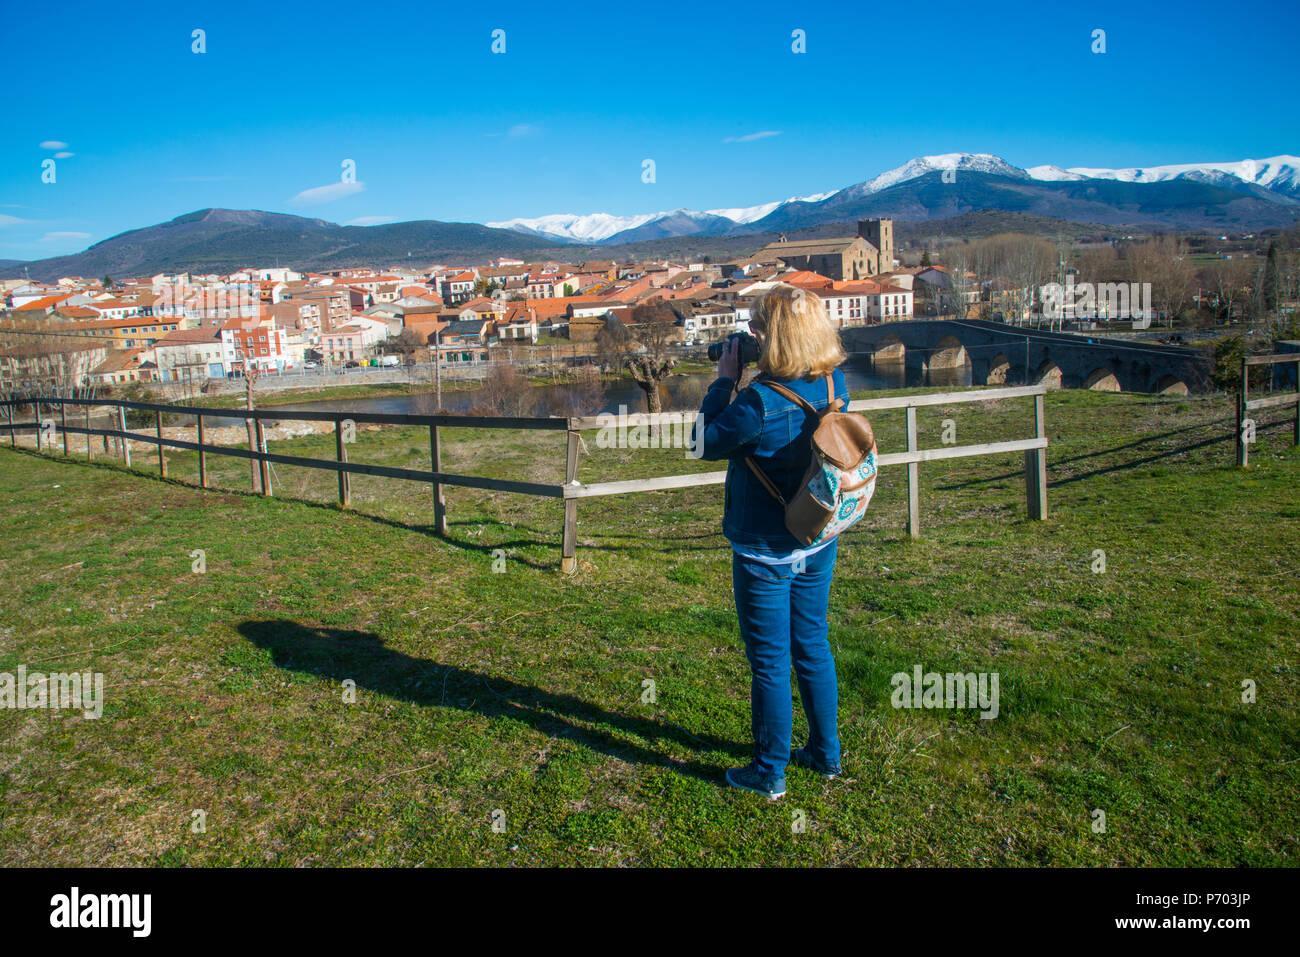 Woman taking photos of the village. El Barco de Avila, Avila province, Castilla Leon, Spain. - Stock Image